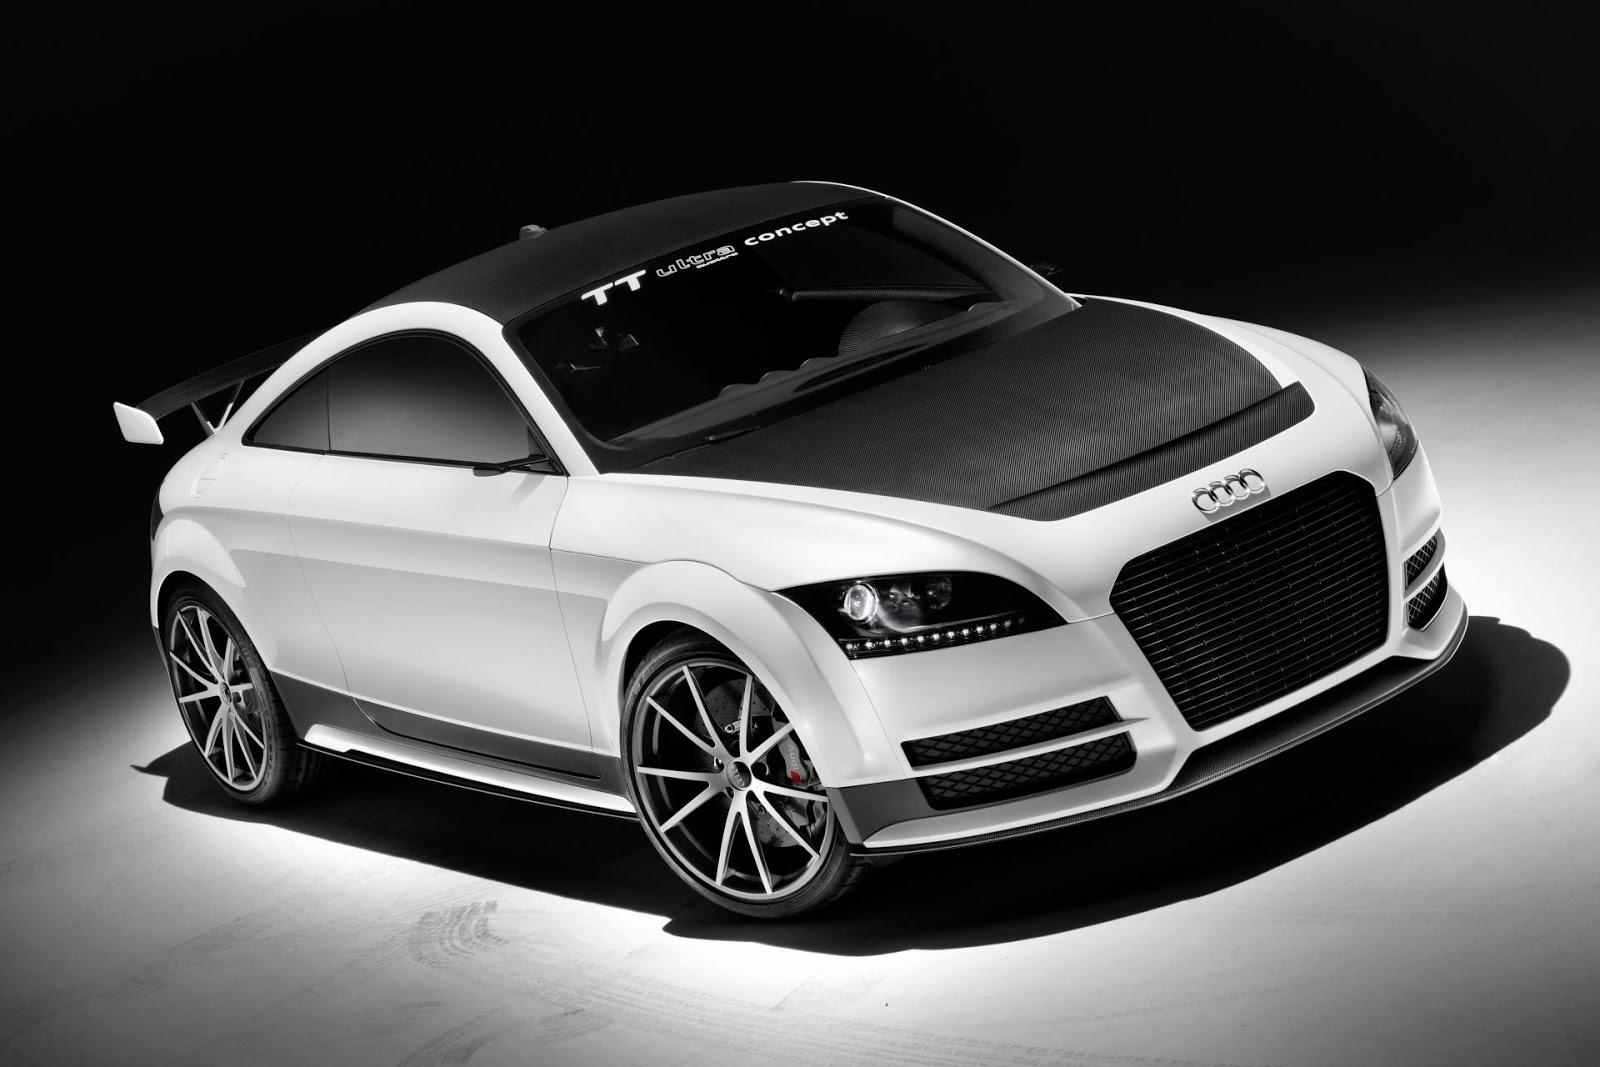 audi tt ultra quattro concept 2013 hottest car wallpapers bestgarage. Black Bedroom Furniture Sets. Home Design Ideas